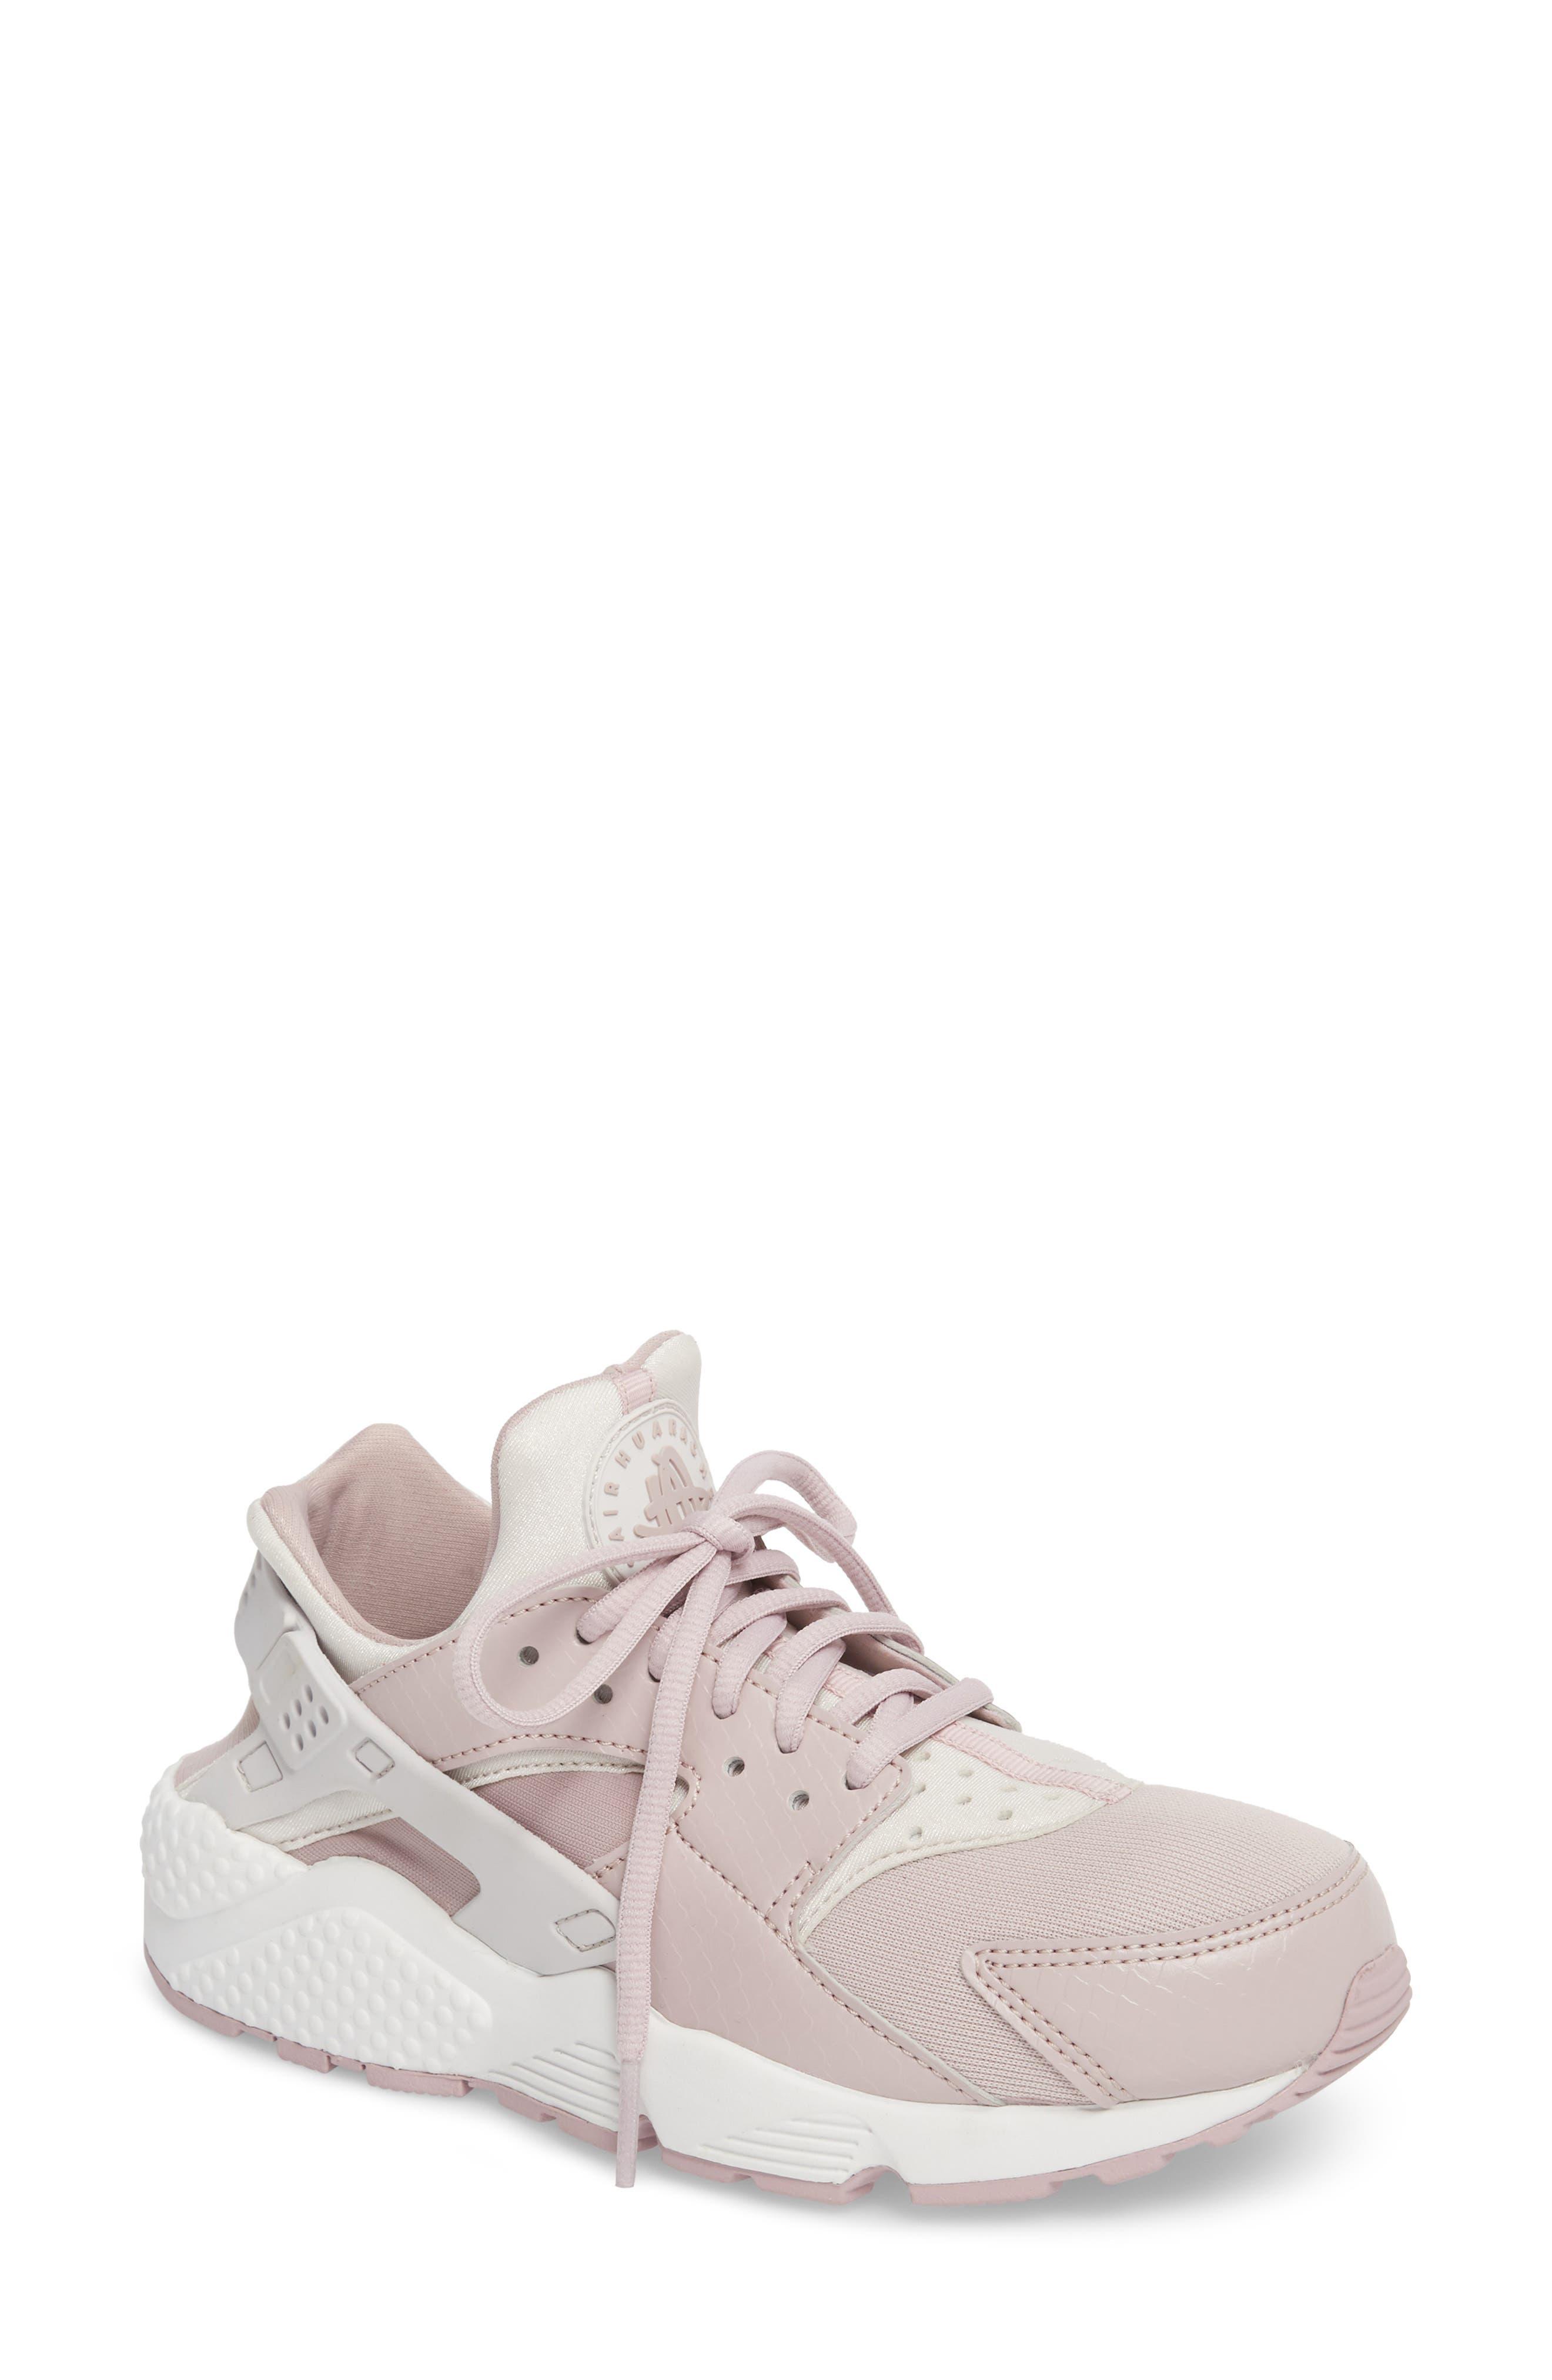 Nike Air Huarache Run Sneaker (Women)